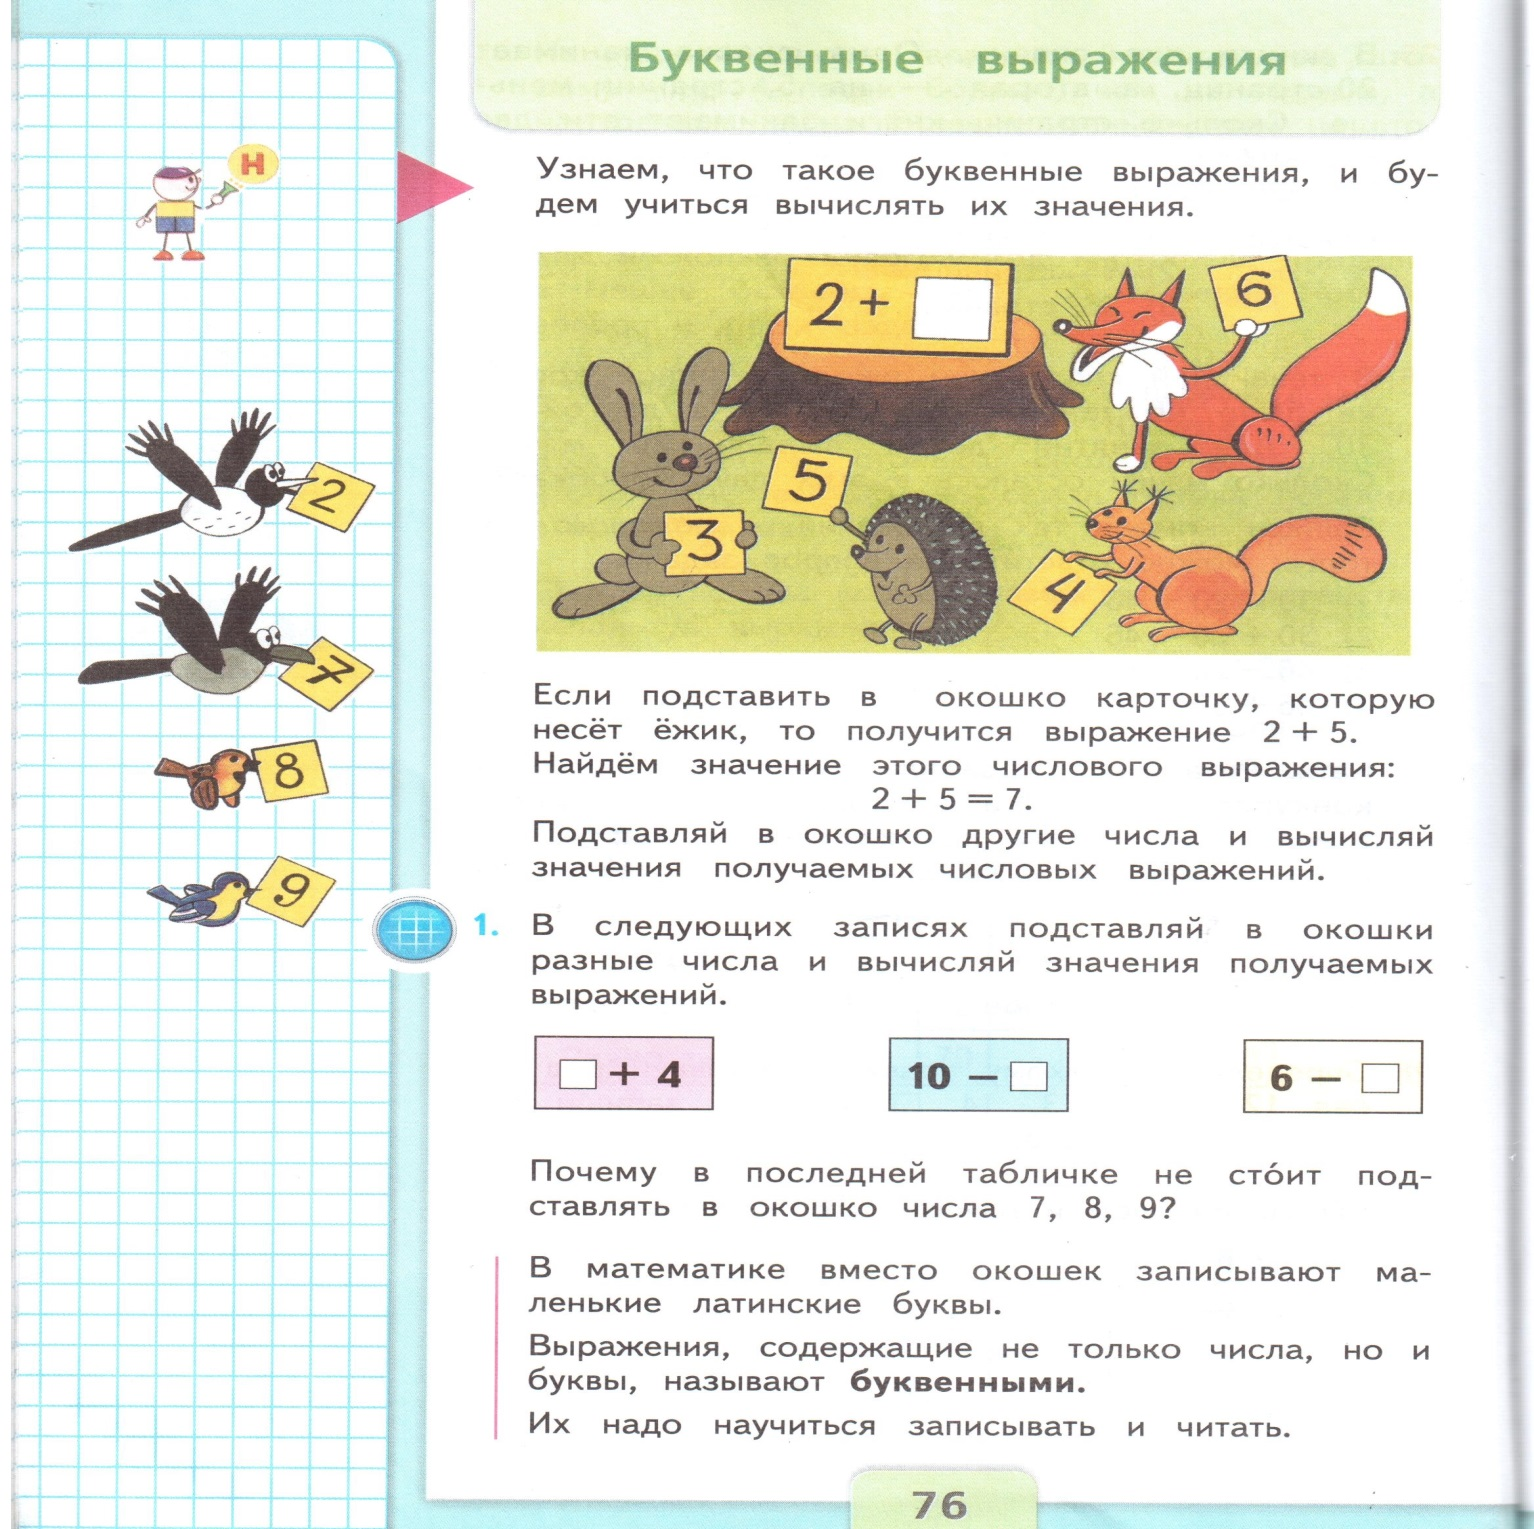 C:\Users\Ольга\Desktop\2015-06-07 1\1 001.jpg